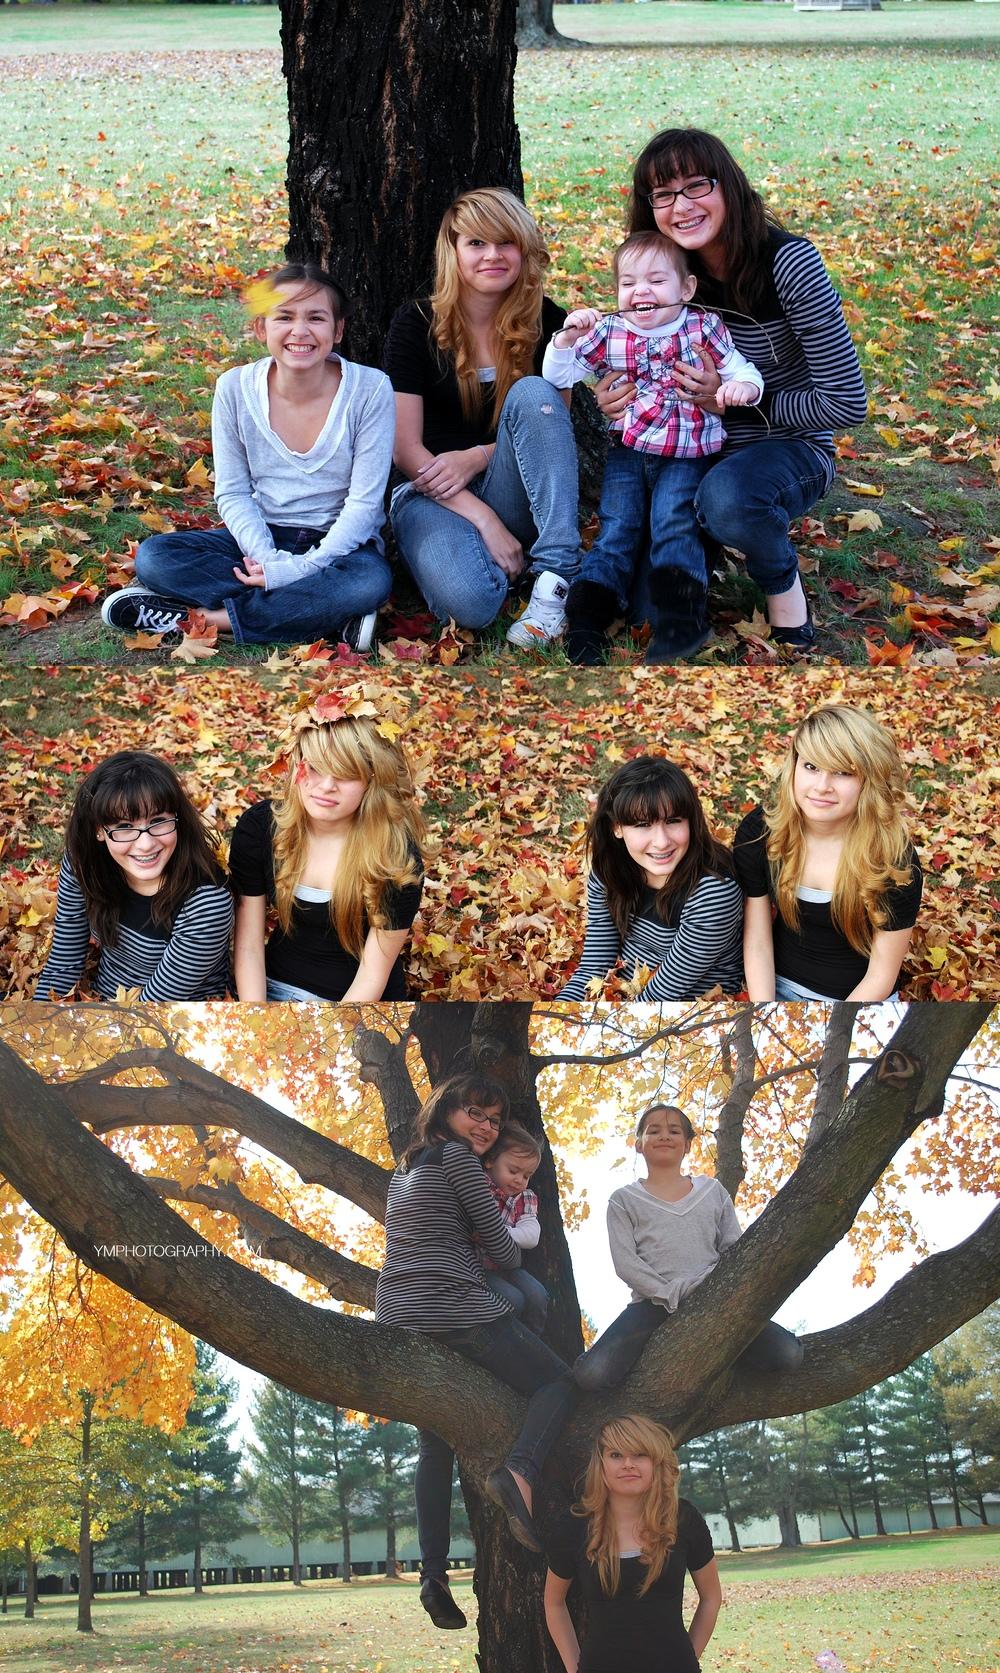 2010 Family Portrait © ymphotography 2015 www.ymphotography.com